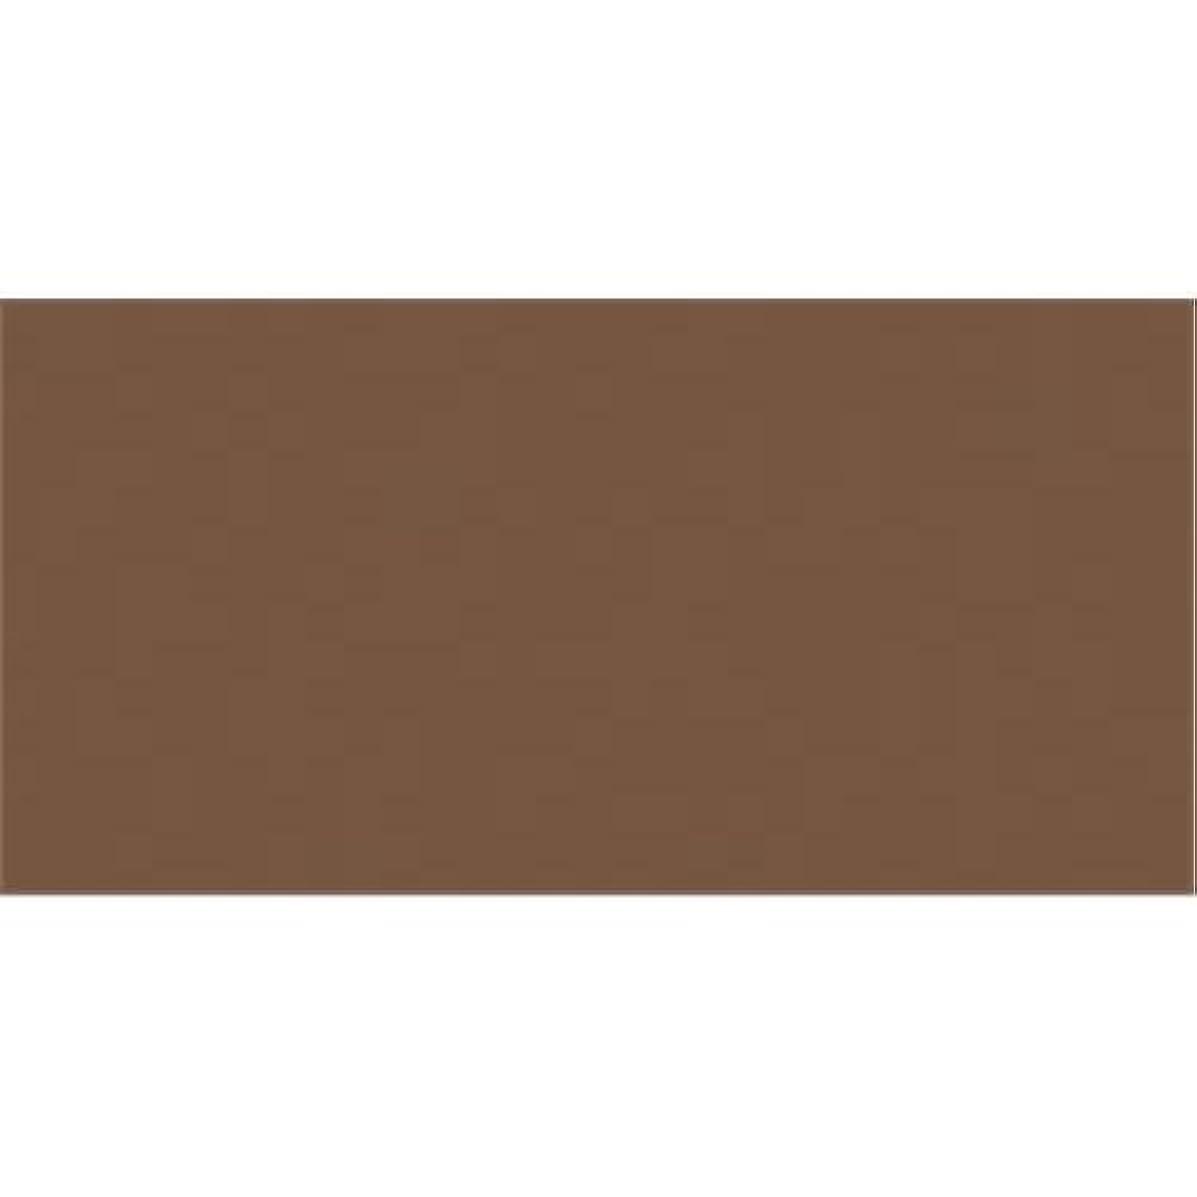 American & Efird All-Purpose Polyester Thread 547 Yards-Chocolat